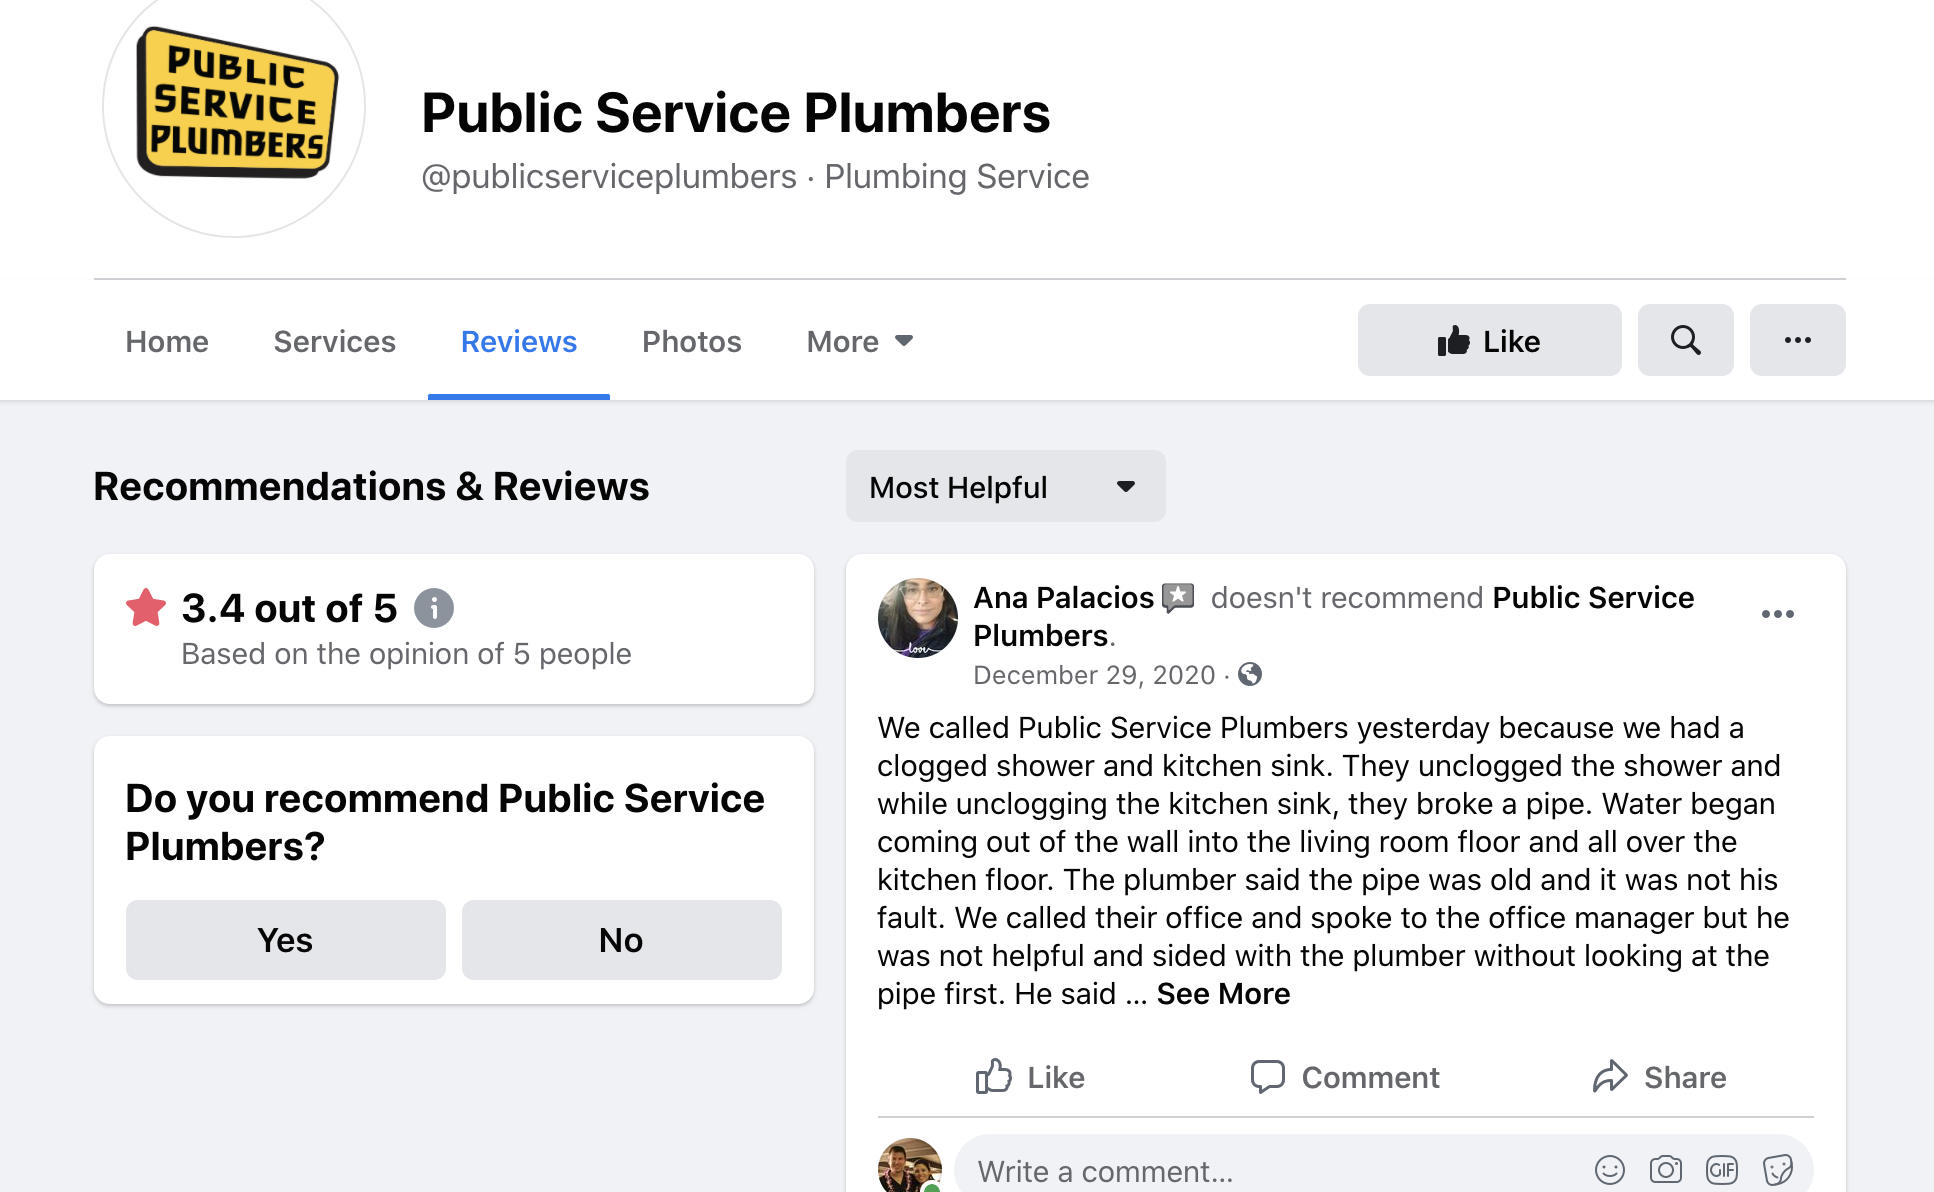 Public Service Plumbers 3.4